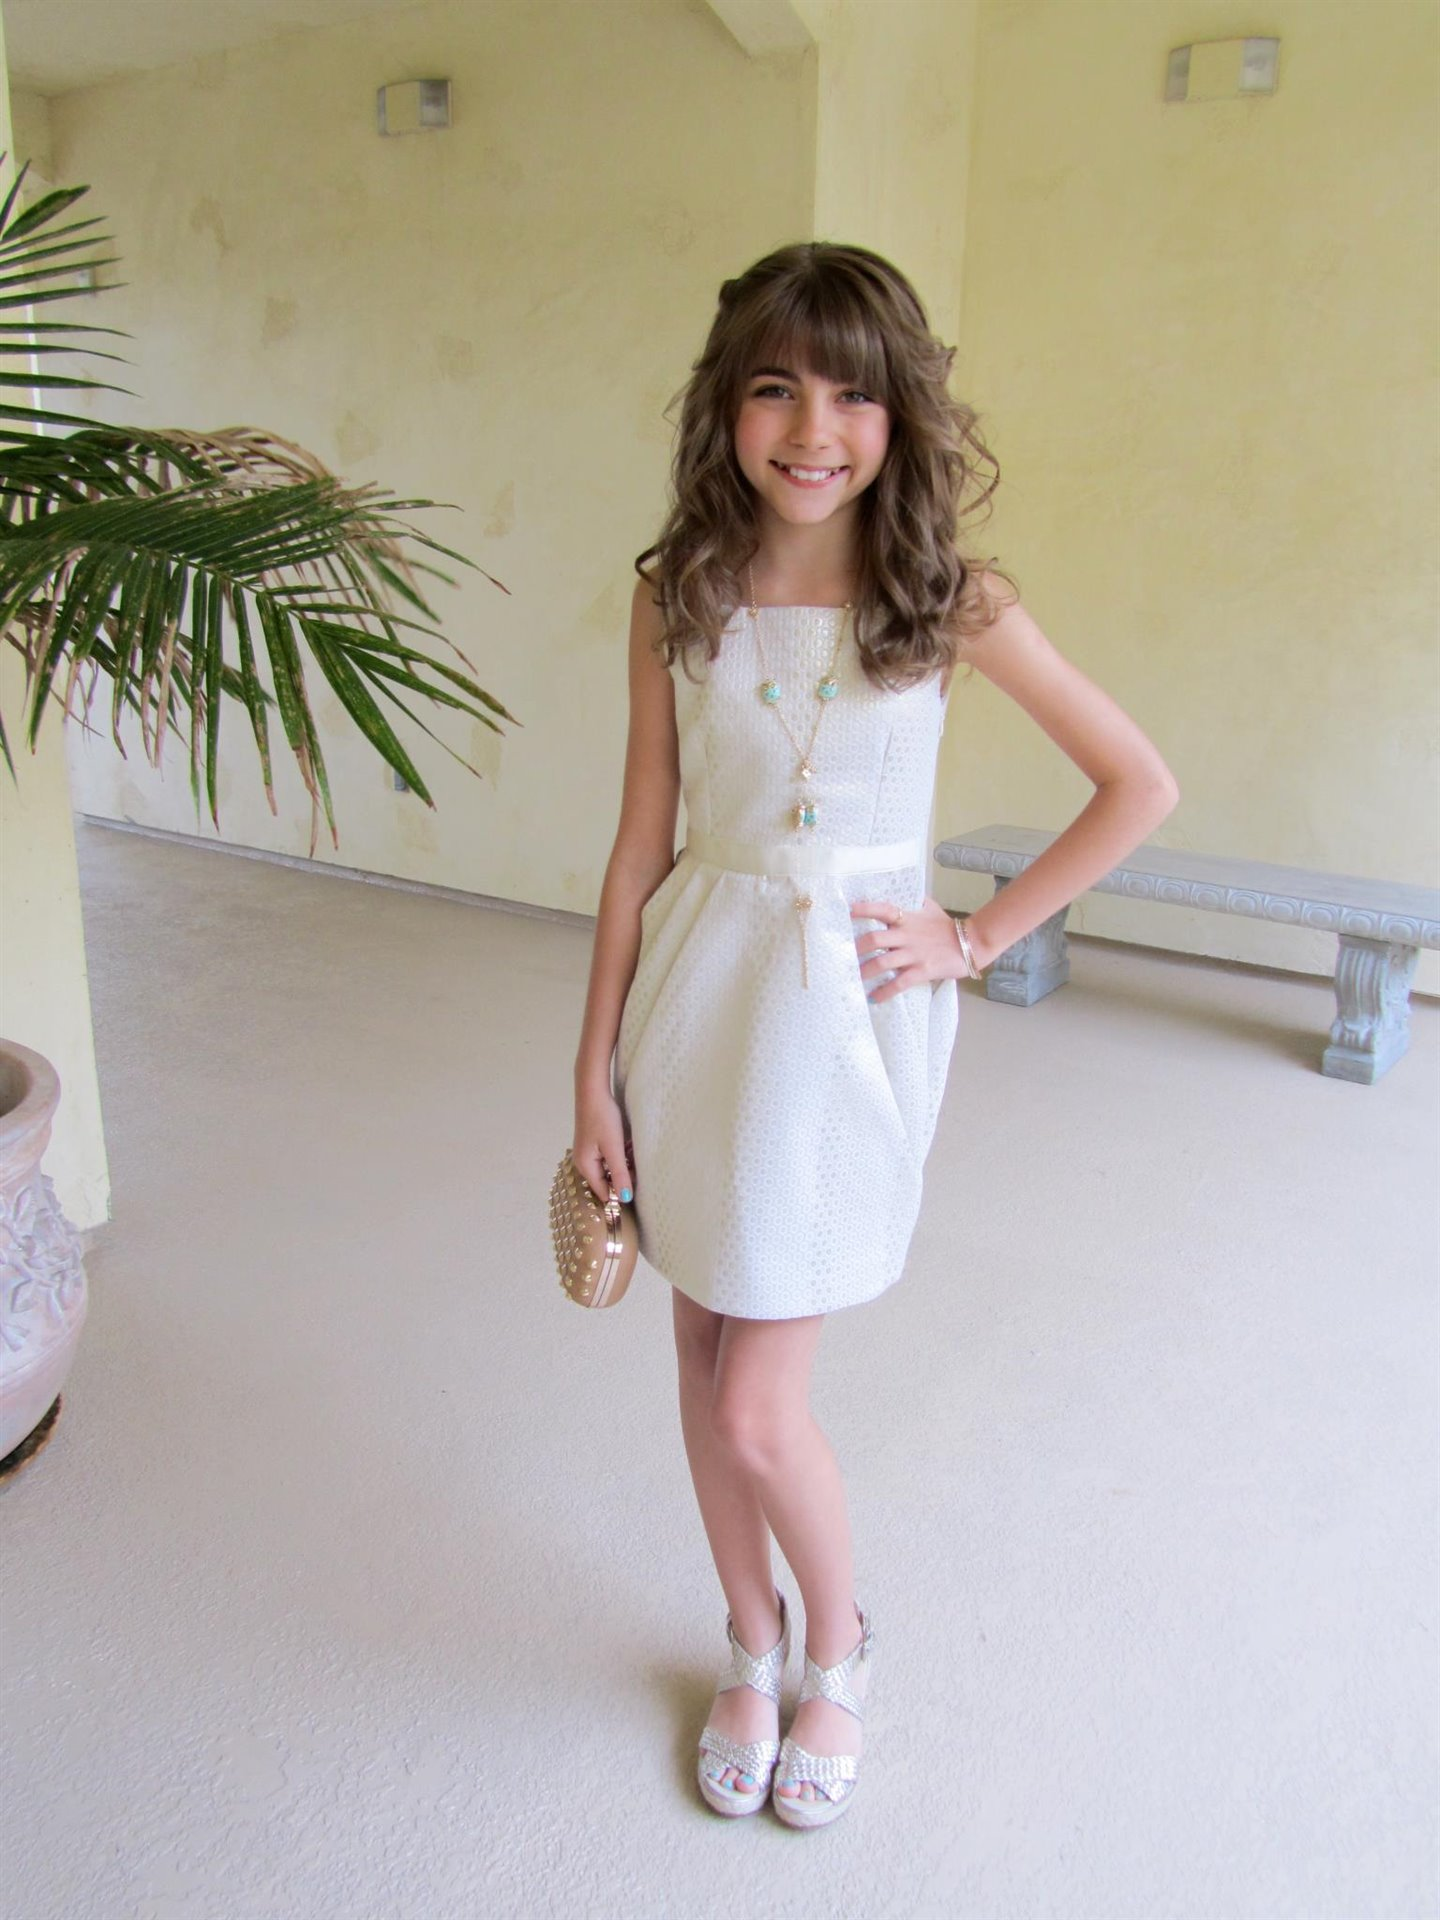 Jada Facer @ kids'musi... Dakota Fanning Instagram